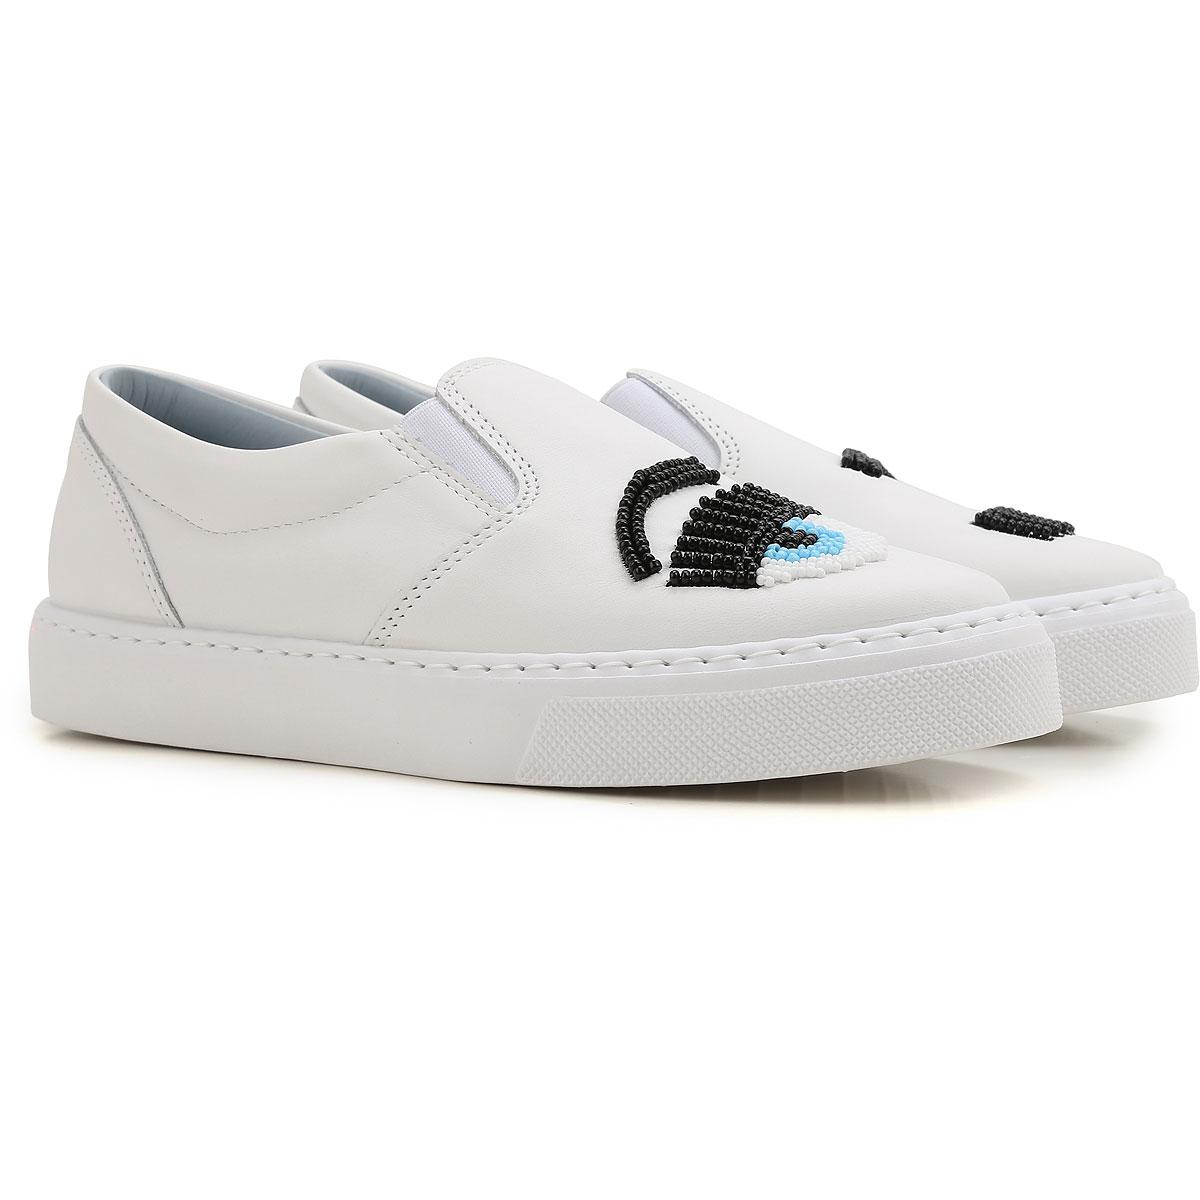 Womens Shoes Chiara Ferragni Style code cf1551 384514